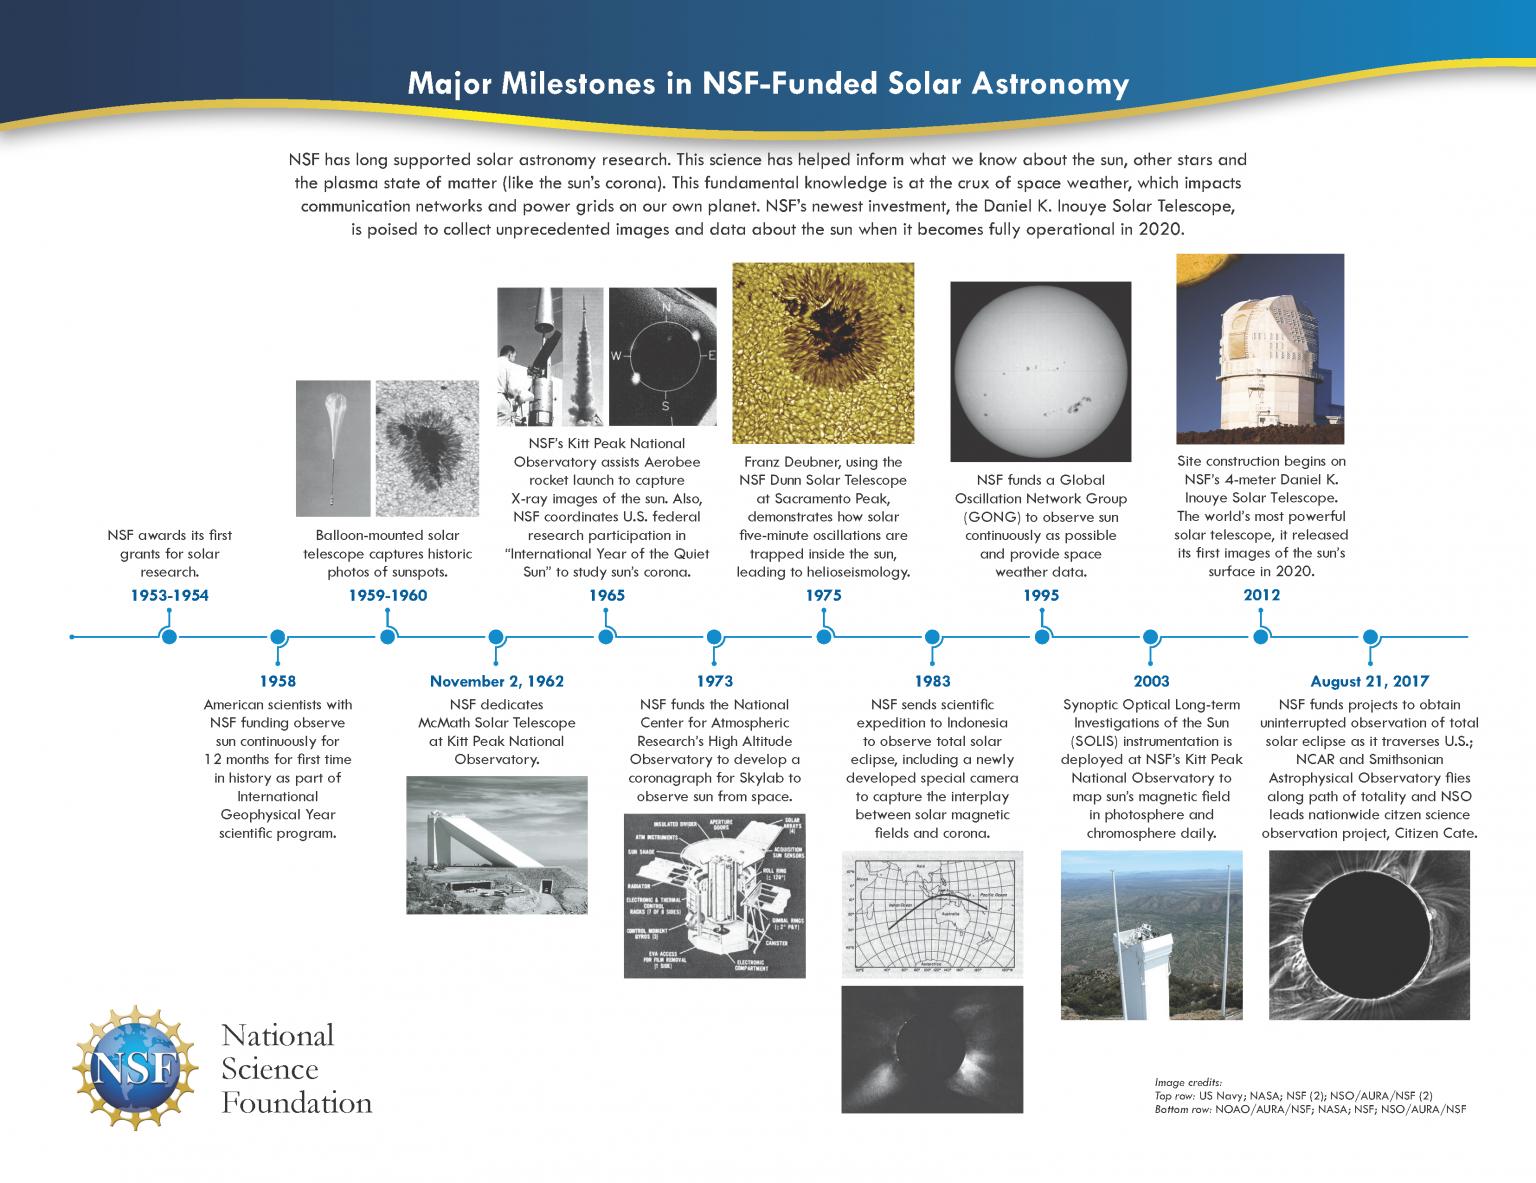 Major milestones in NSF-funded solar astronomy. (Image: NSF)